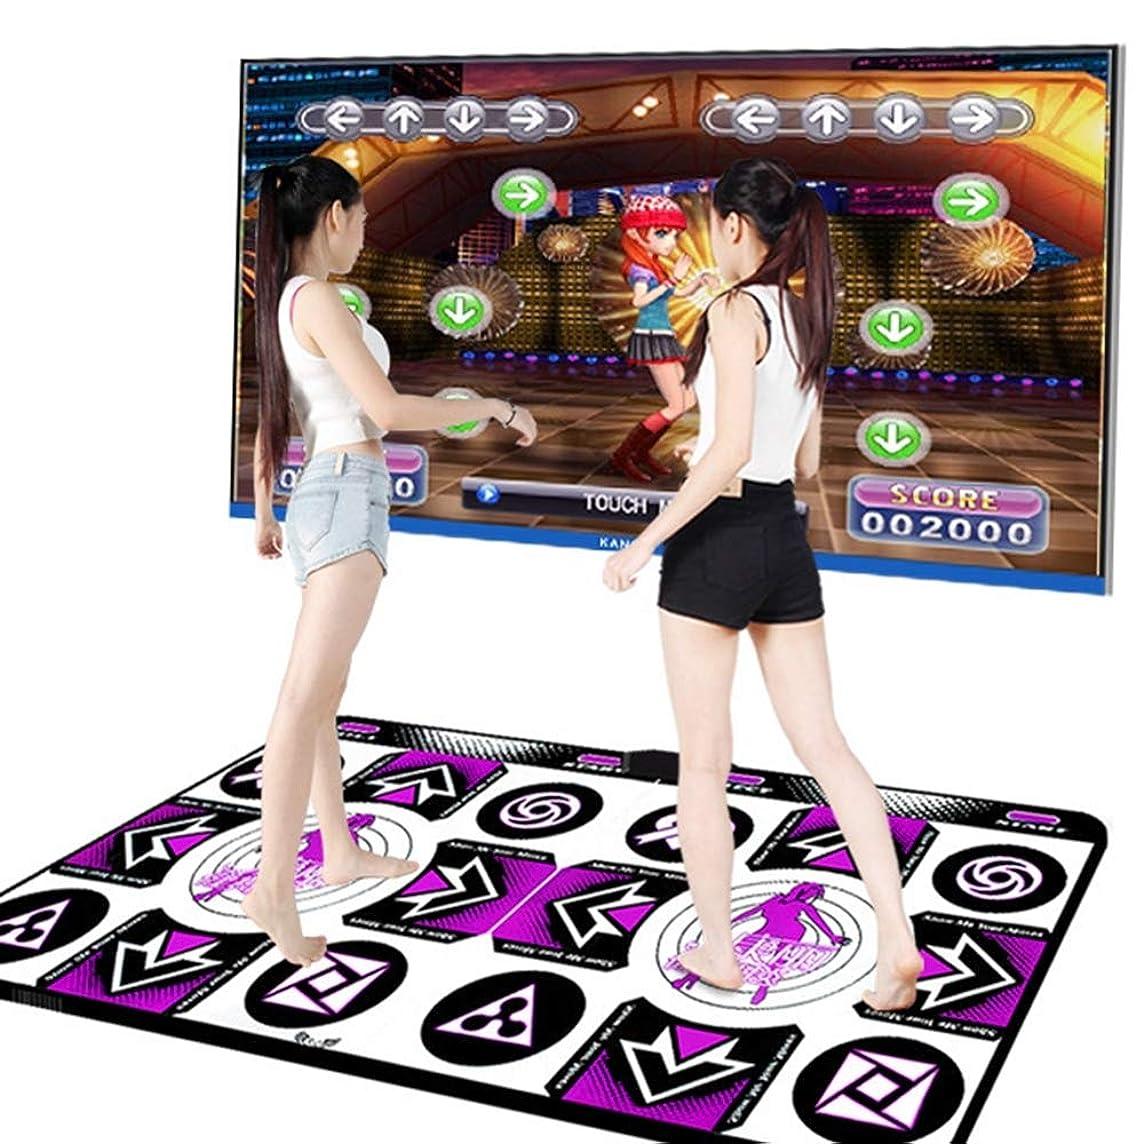 HONG111 Double Dance Mat Wireless Play Mat Cordless Foldable Non-Slip TV Computer Dual-use Somatosensory Dance Mats for Adults Children(English Version)